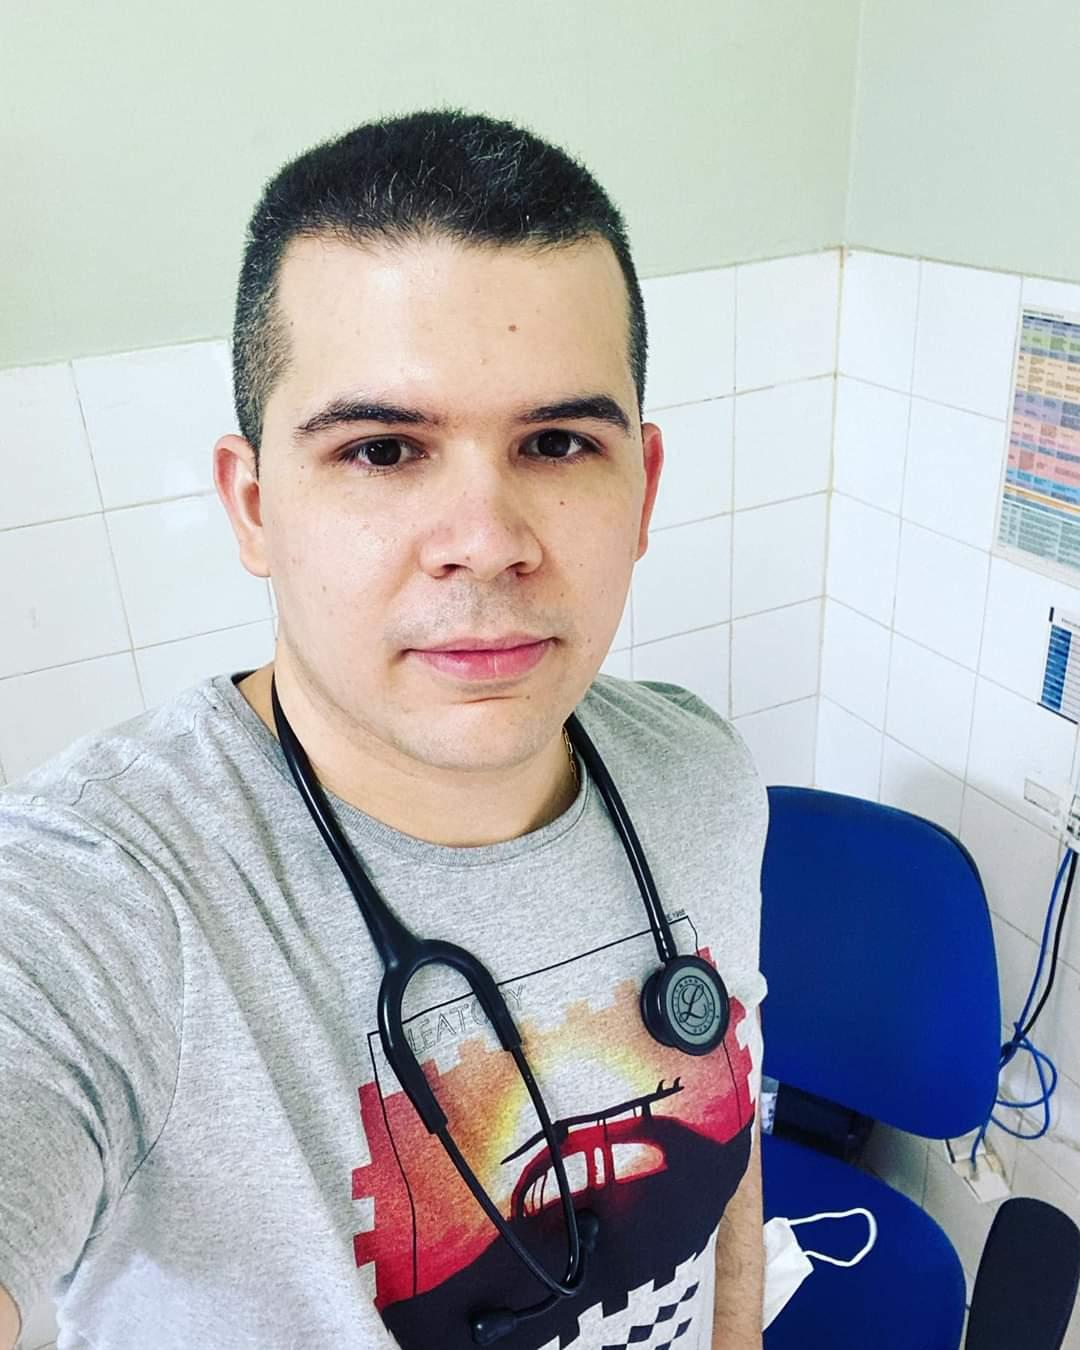 Prefeito João Luiz testa positivo para novo Coronavirus - Imagem 3